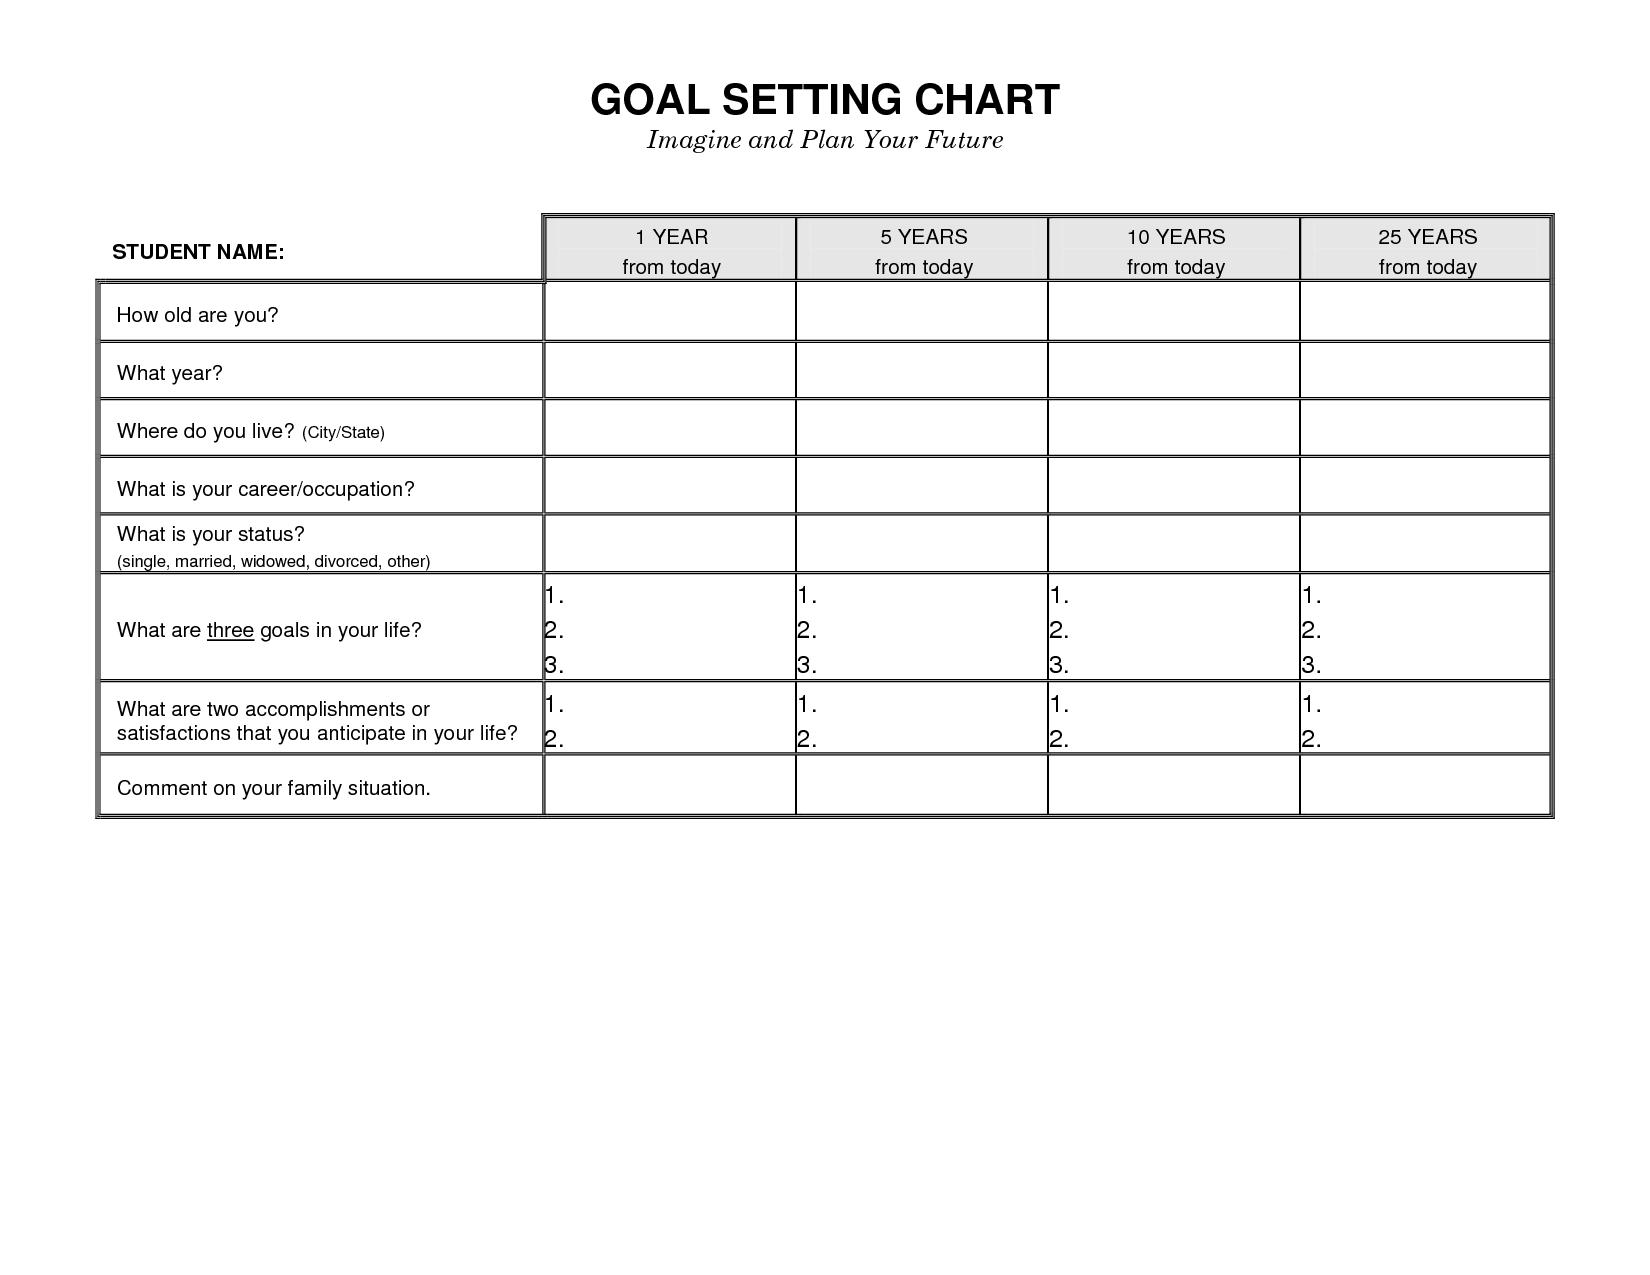 Goal Setting Chart Template